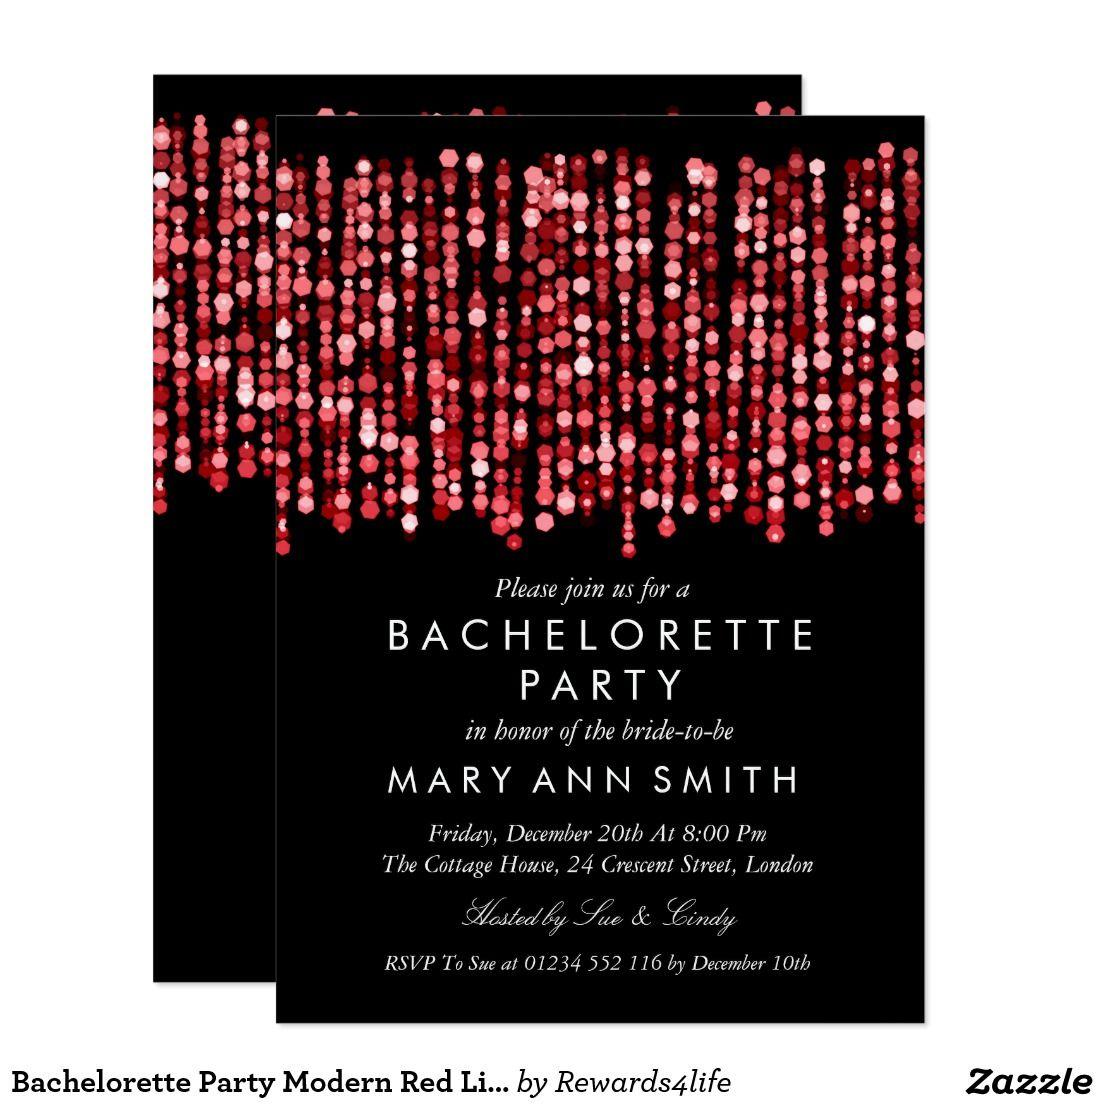 Bachelorette Party Modern Red Lights Invitation | Pinterest ...